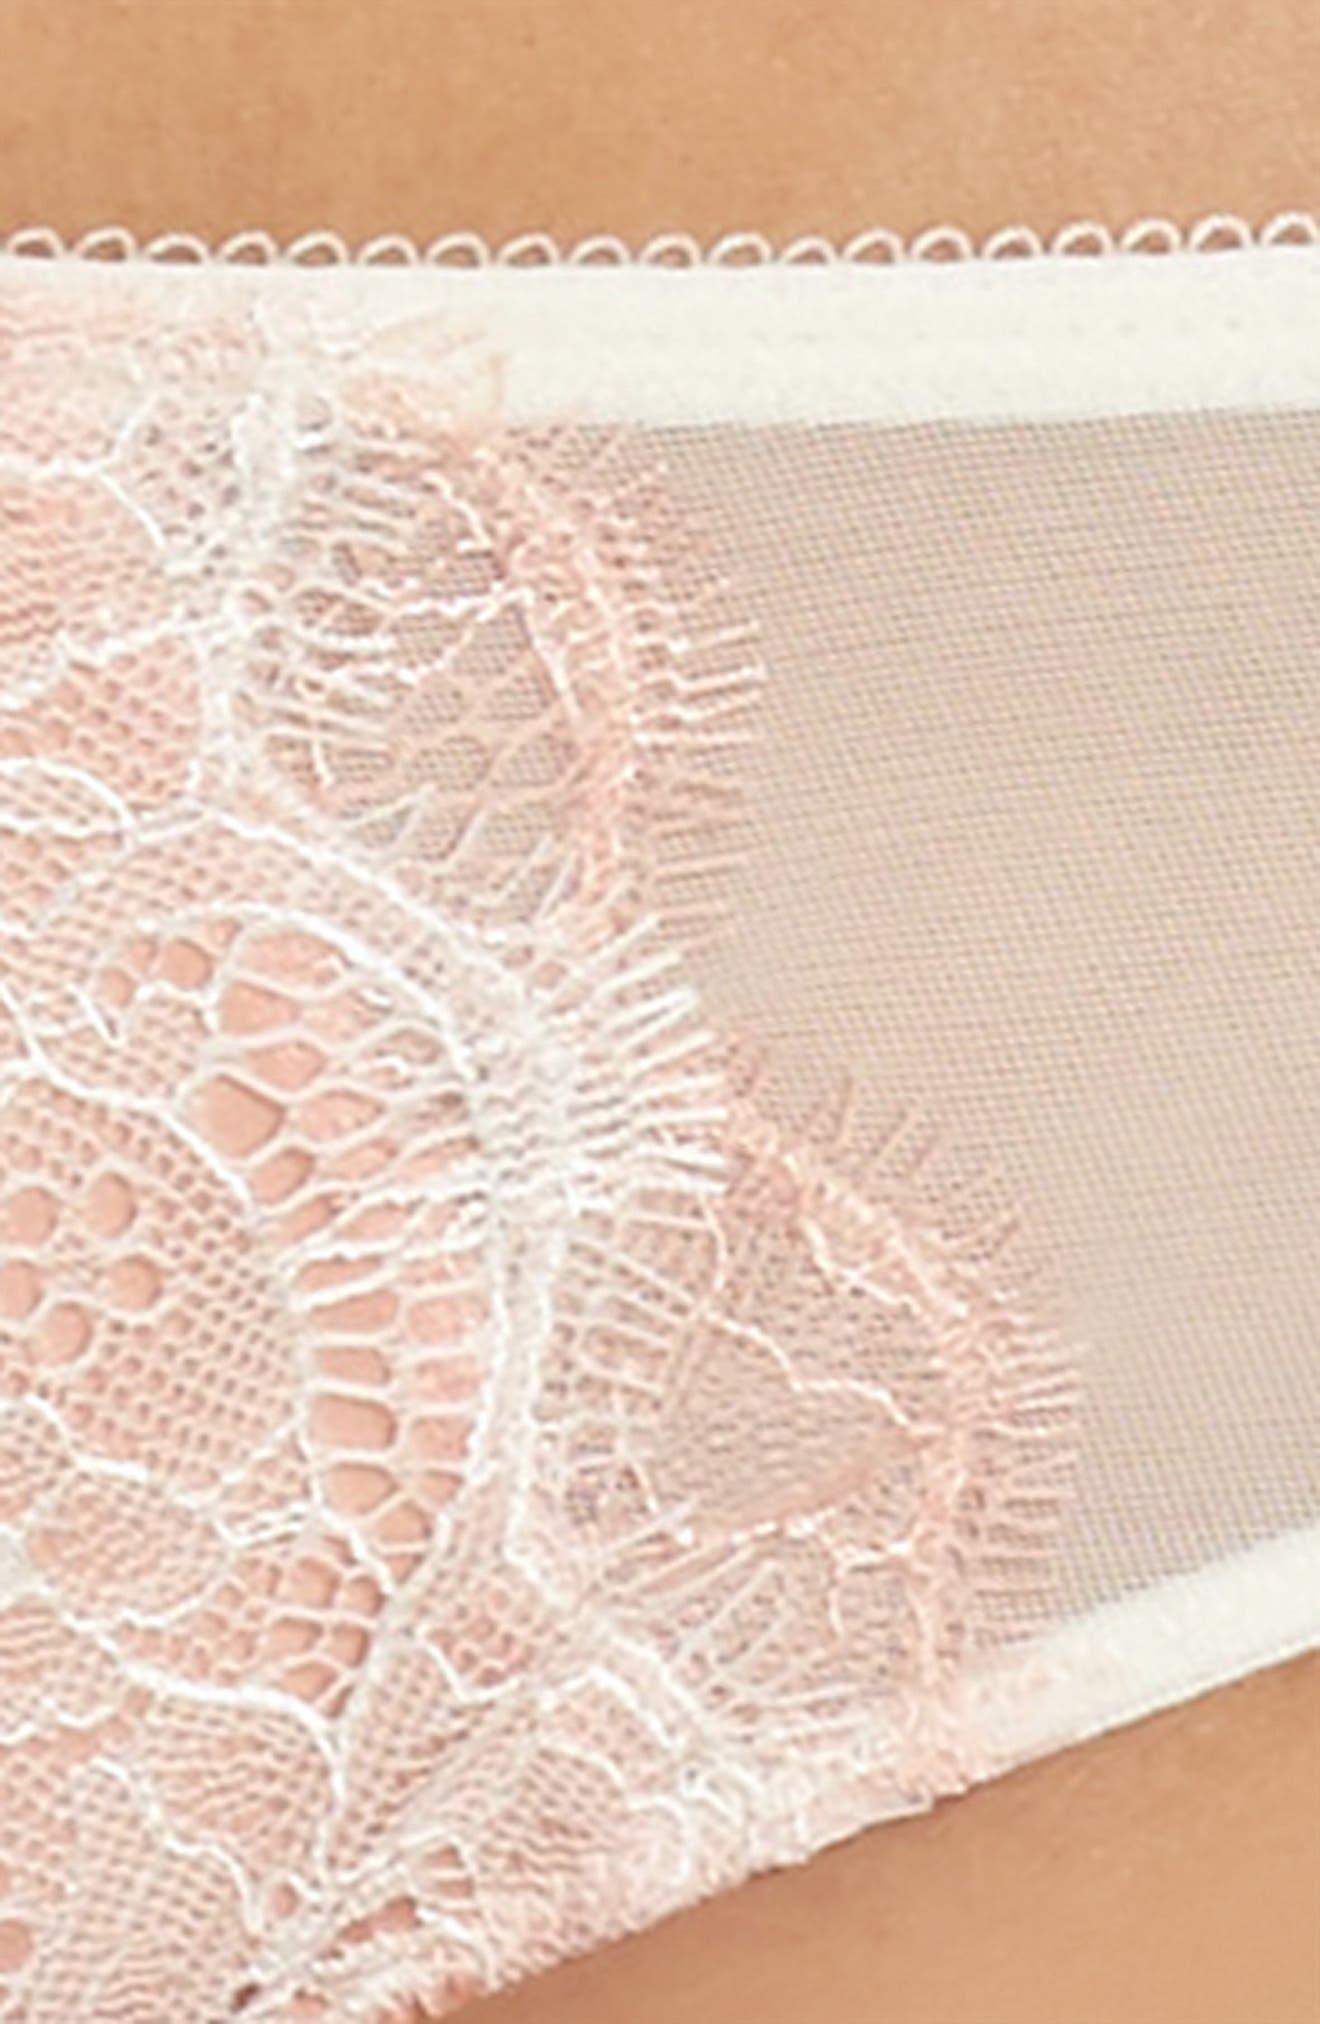 'B Sultry' Bikini,                             Alternate thumbnail 4, color,                             VANILLA ICE/ PEACH BEIGE